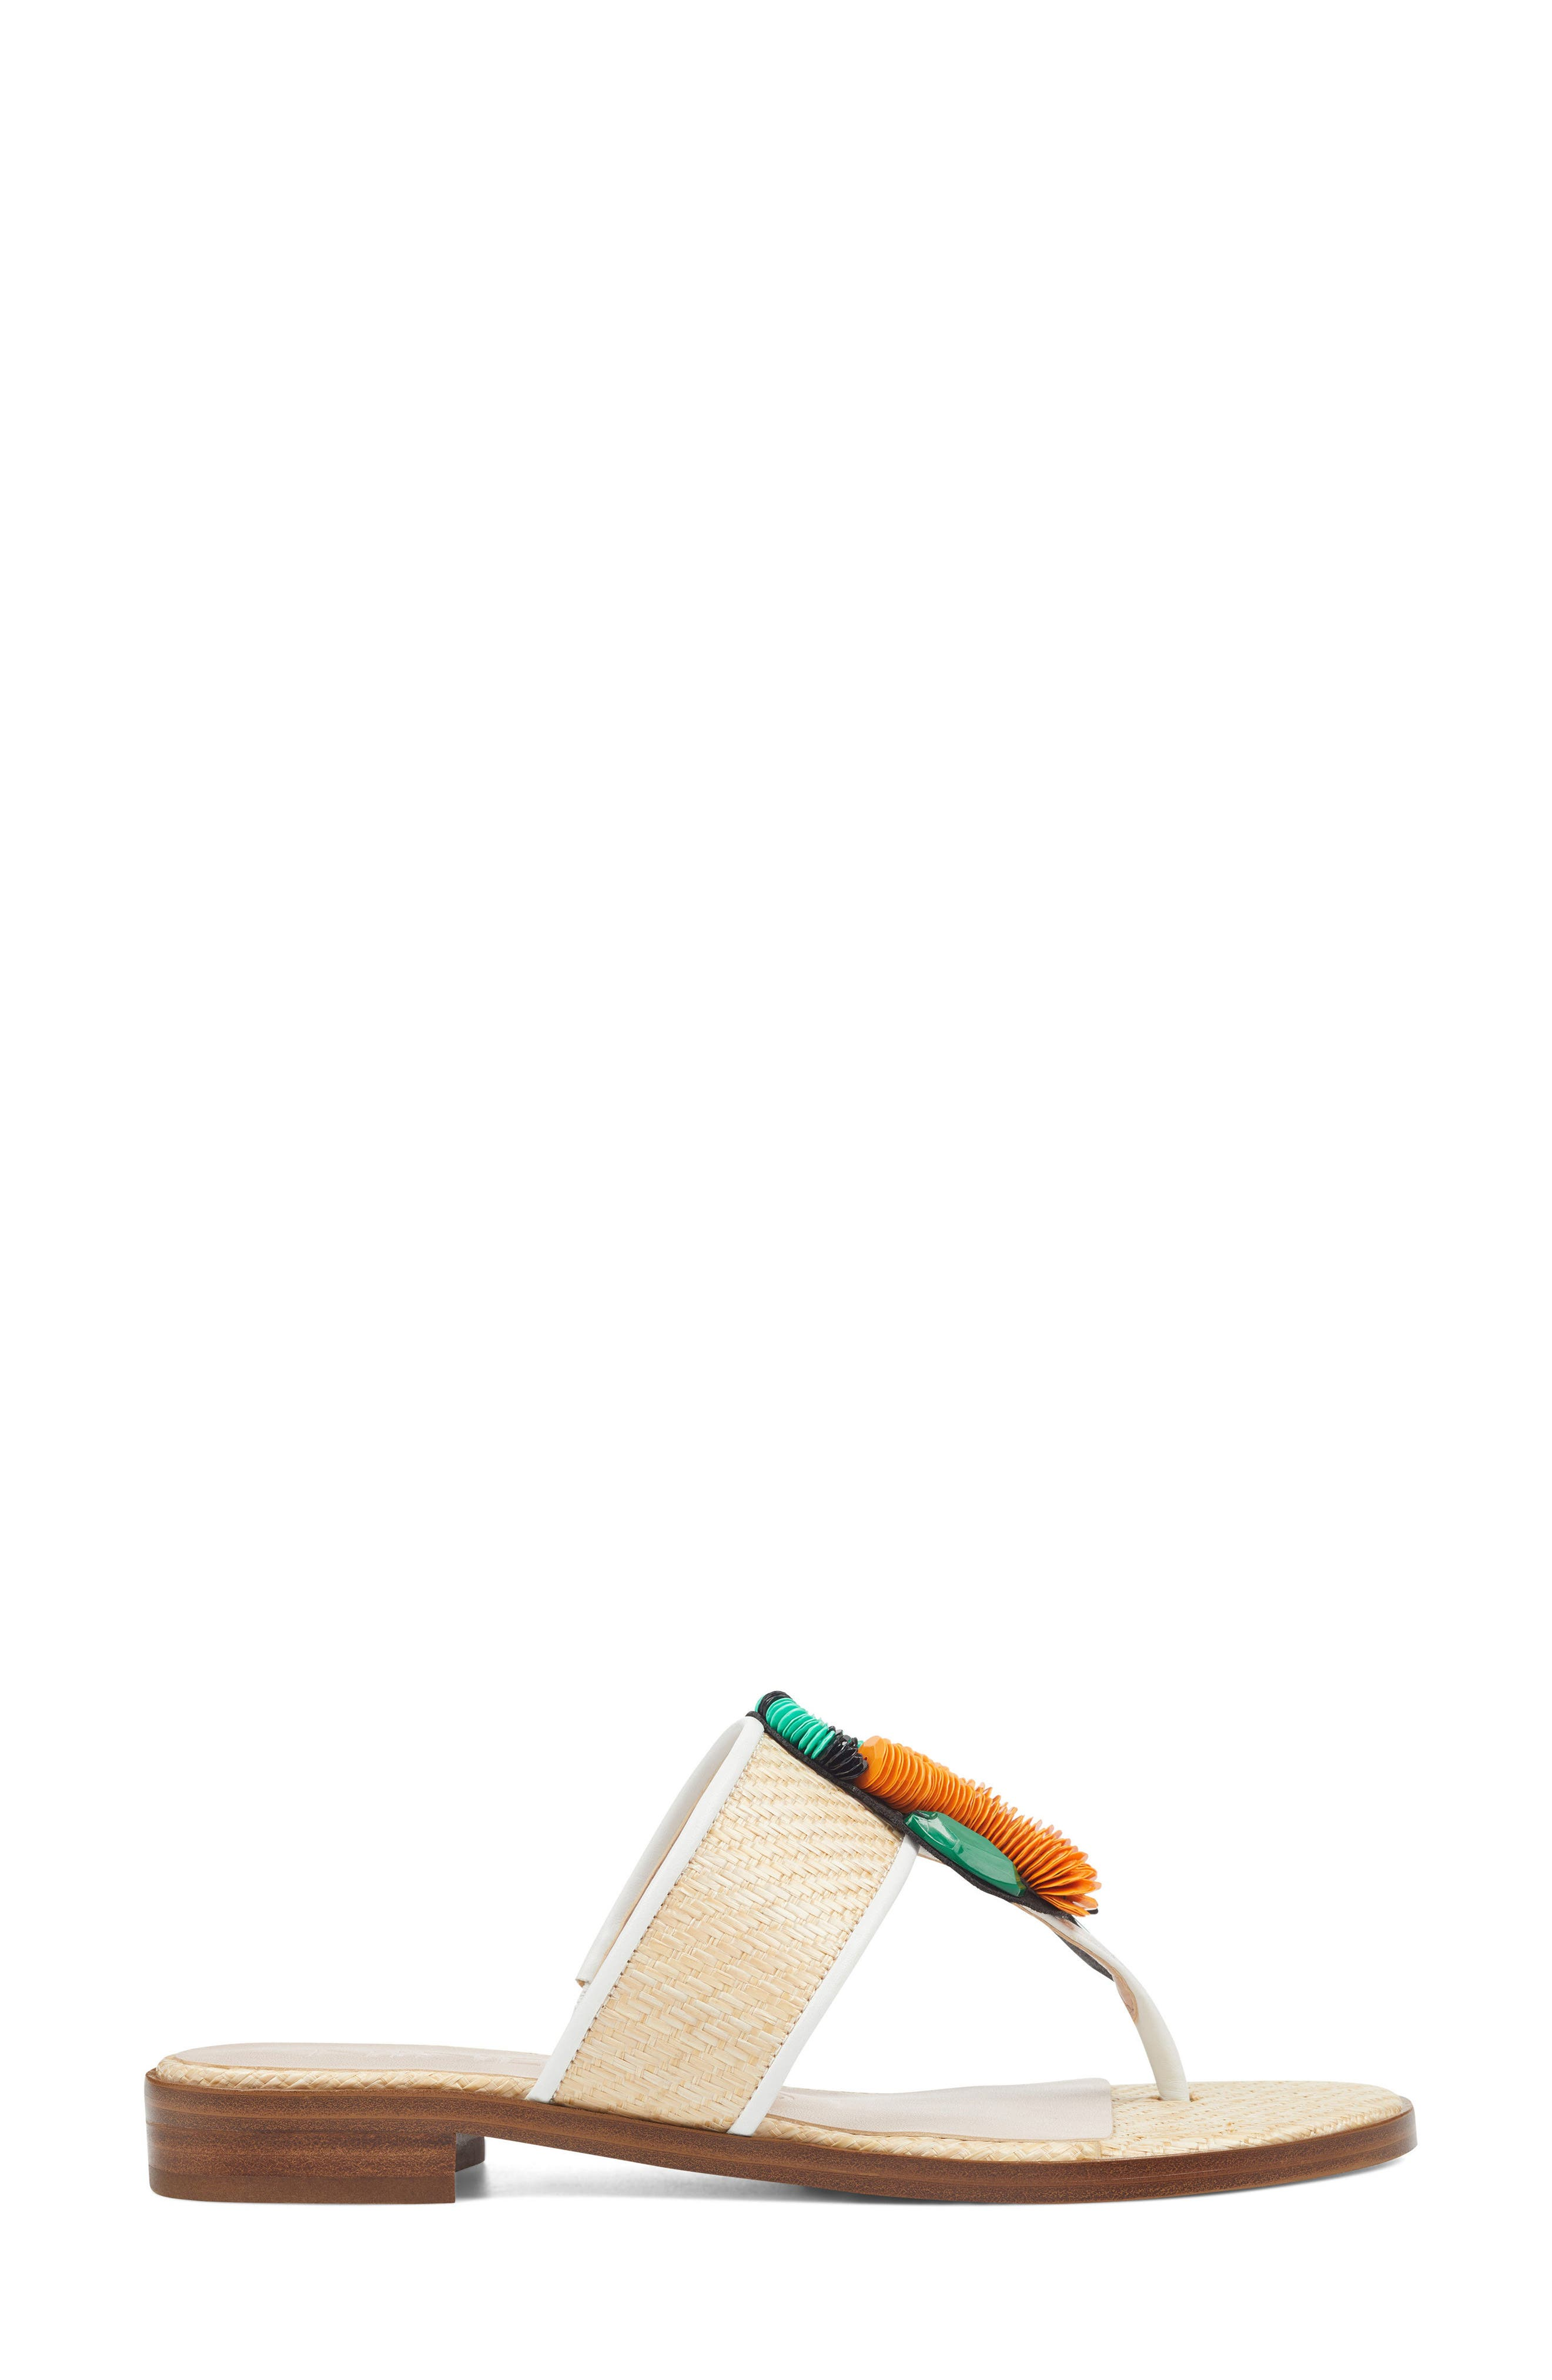 Roseriver Sandal,                             Alternate thumbnail 3, color,                             Natural/ White Fabric